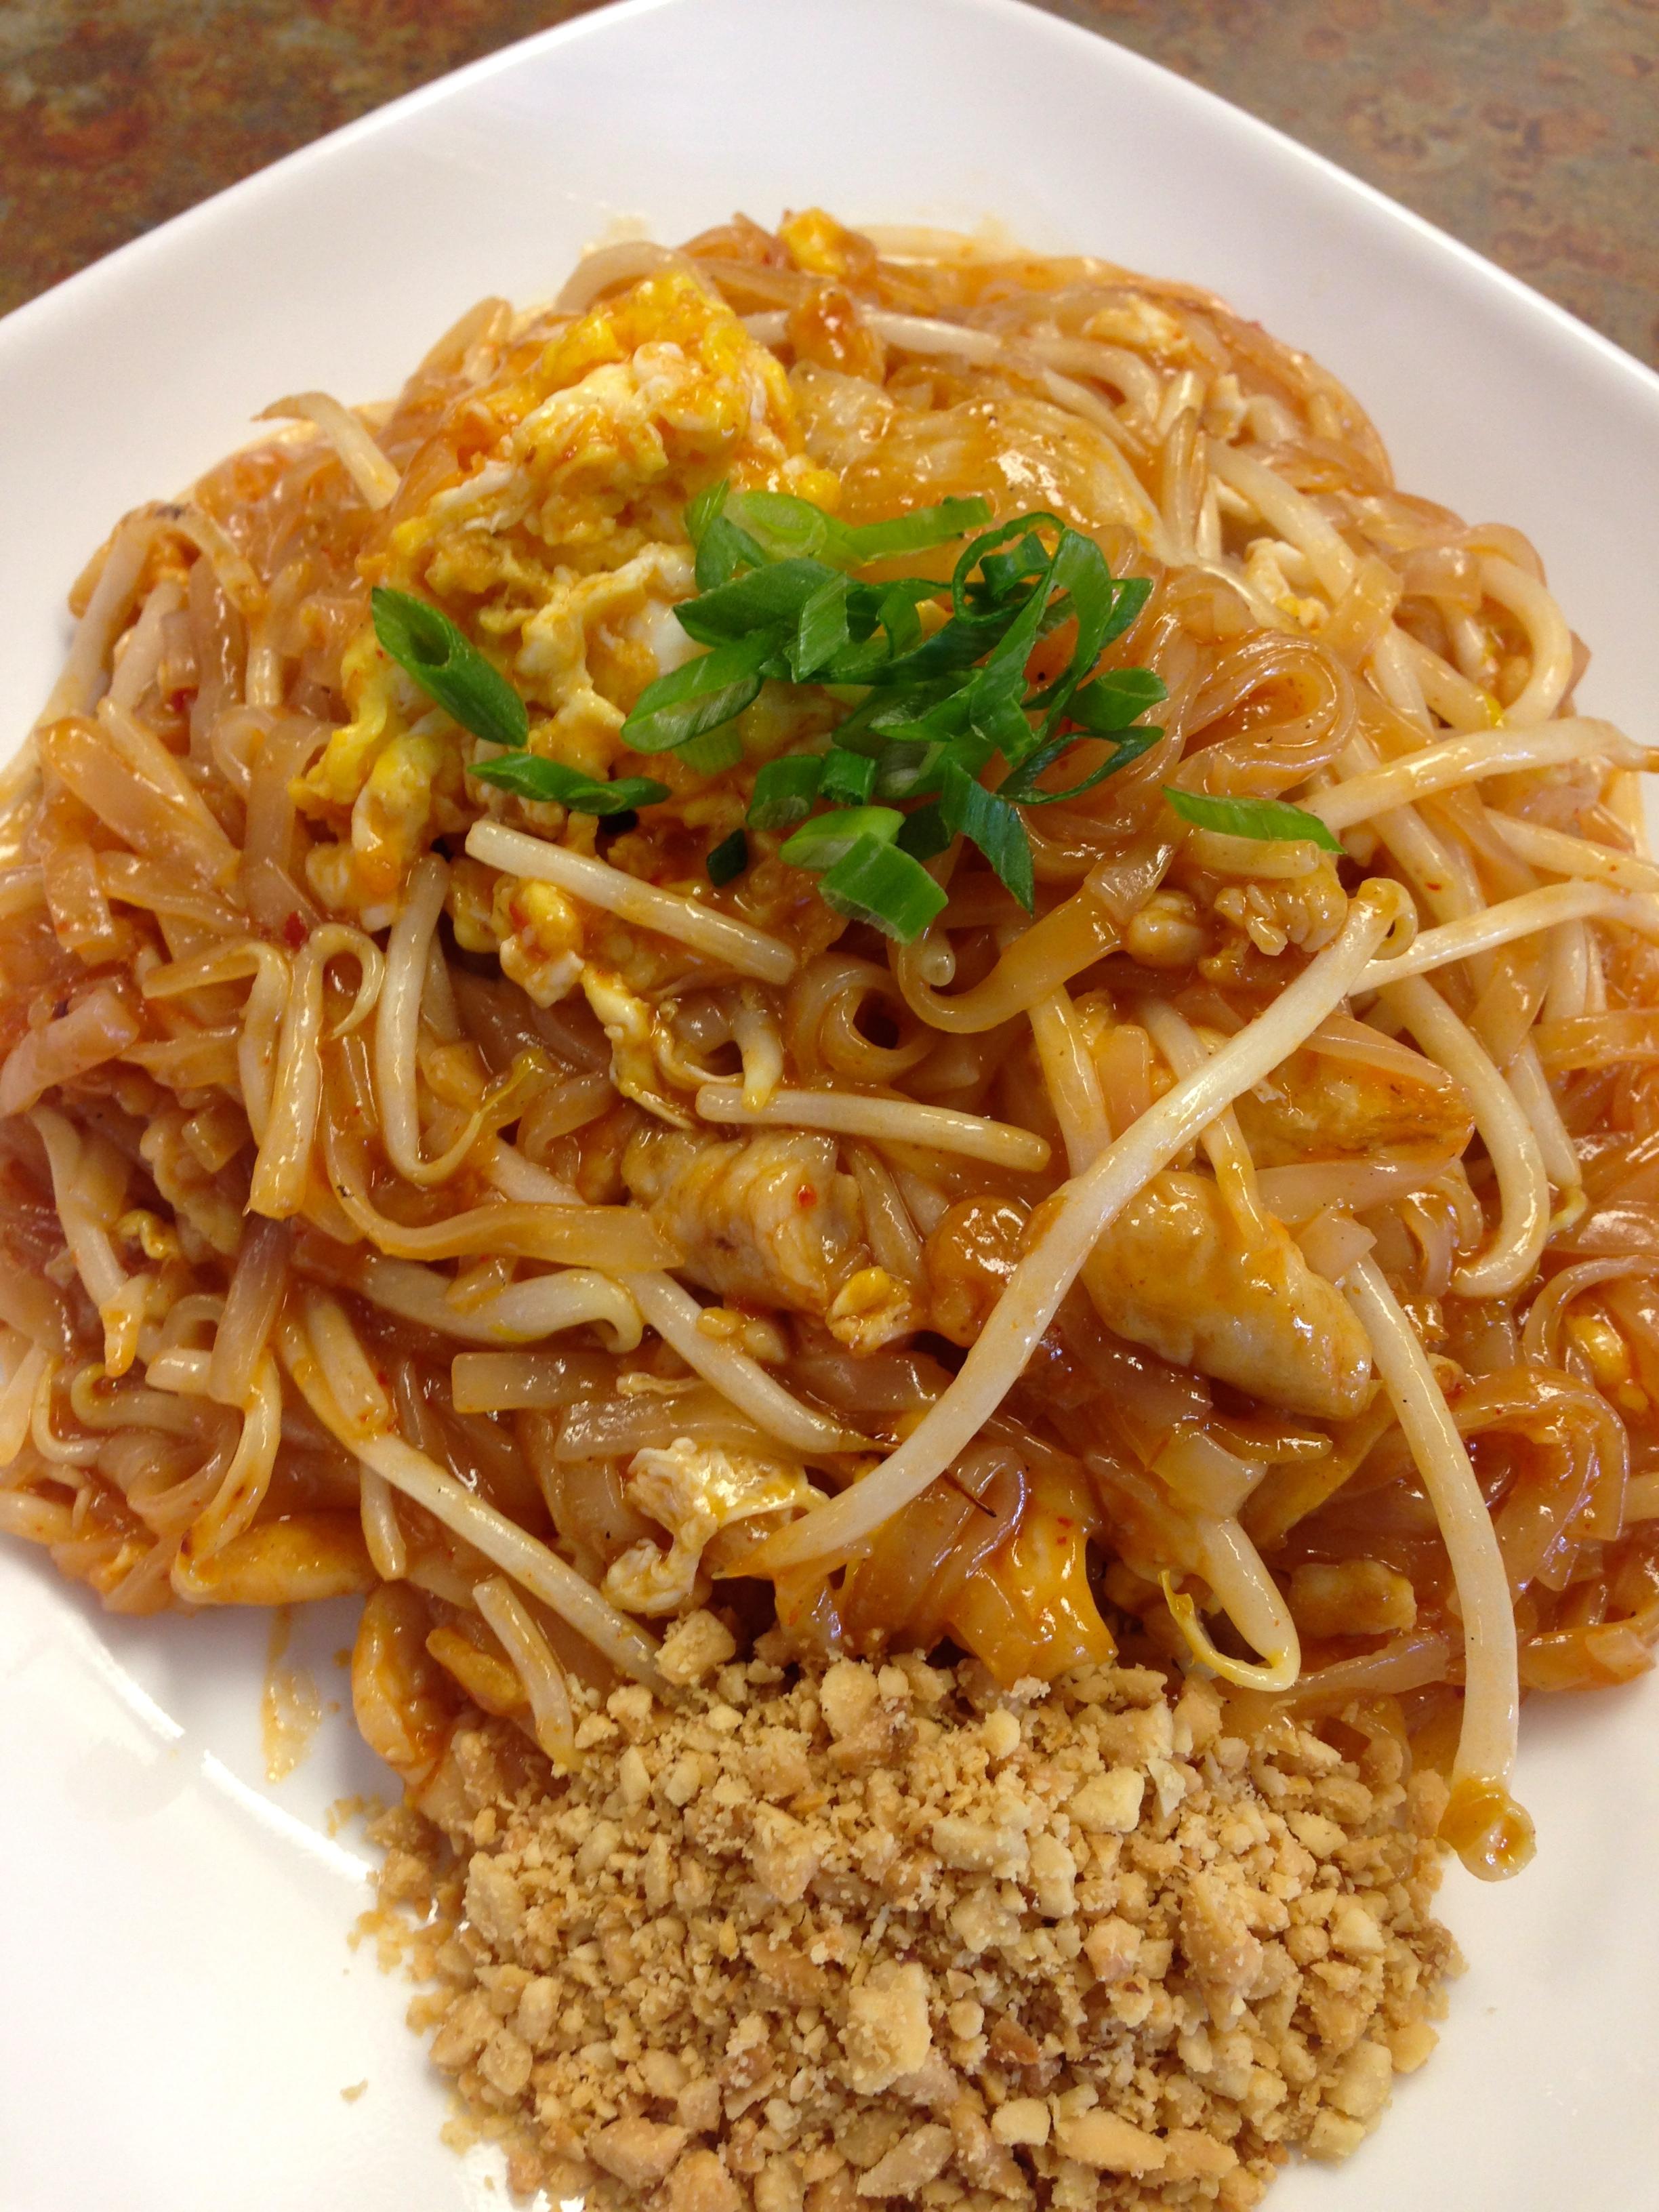 #35 PAD THAI Image